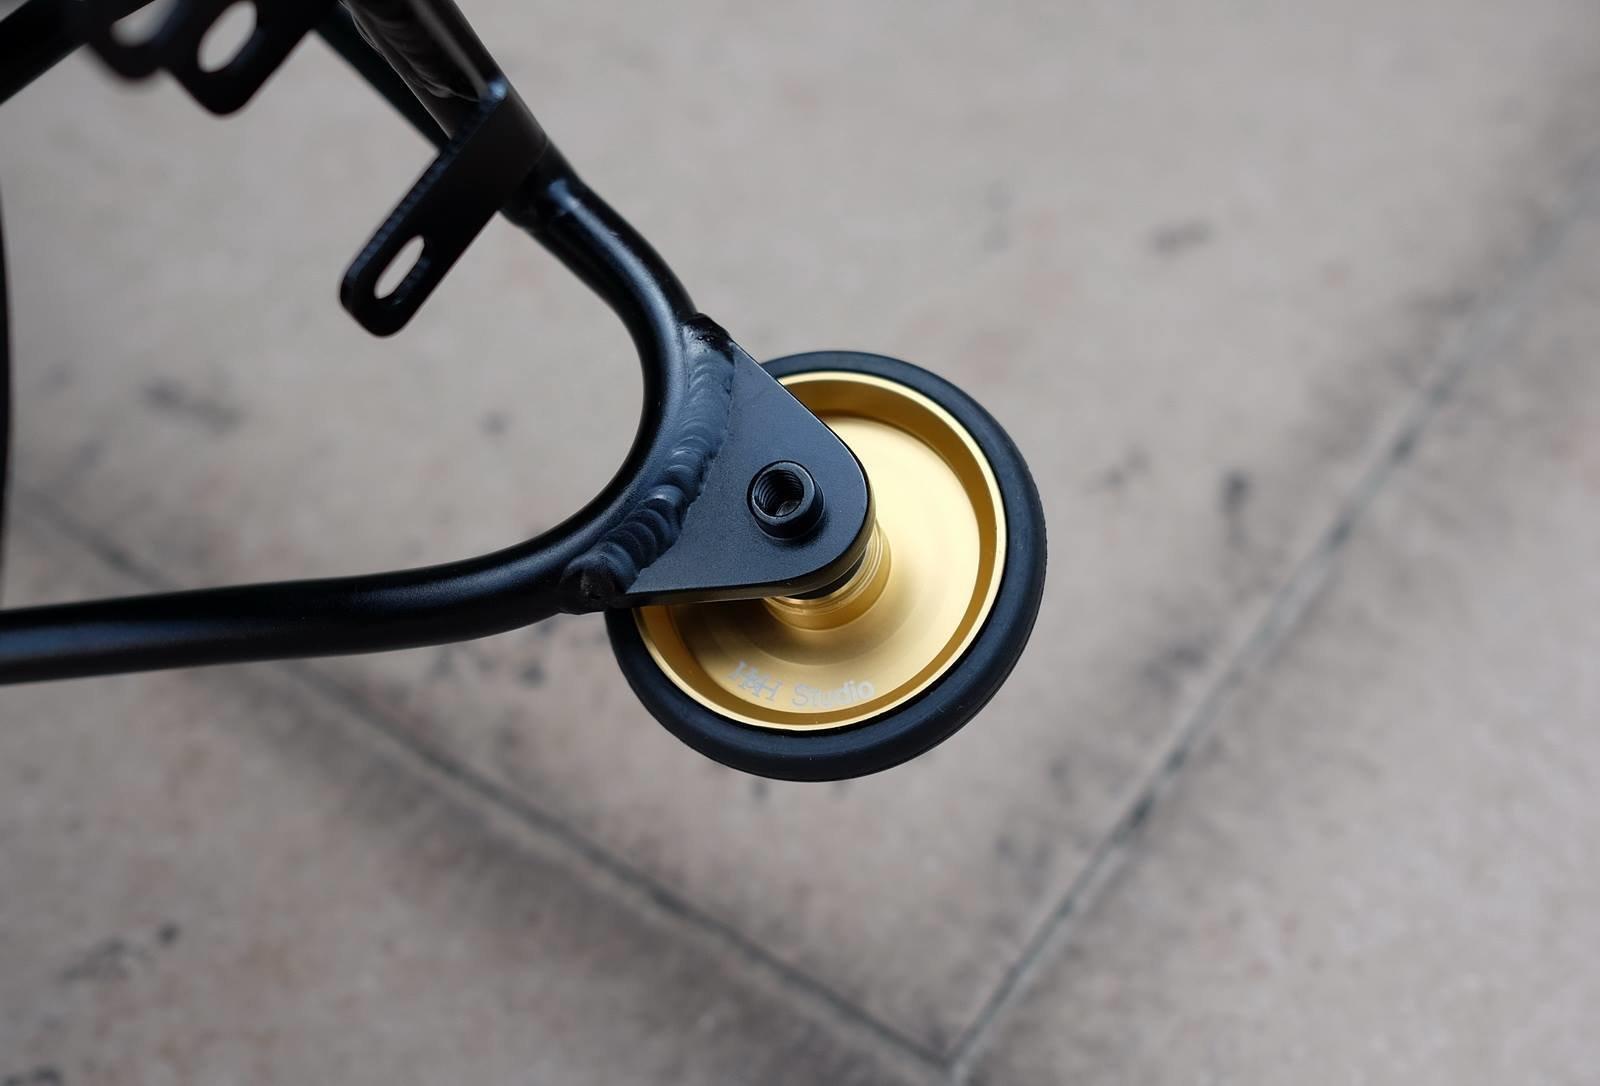 ezwheels Bearing easy wheel Brompton Birdy CarryMe Lightweight Aluminum Q 45mm